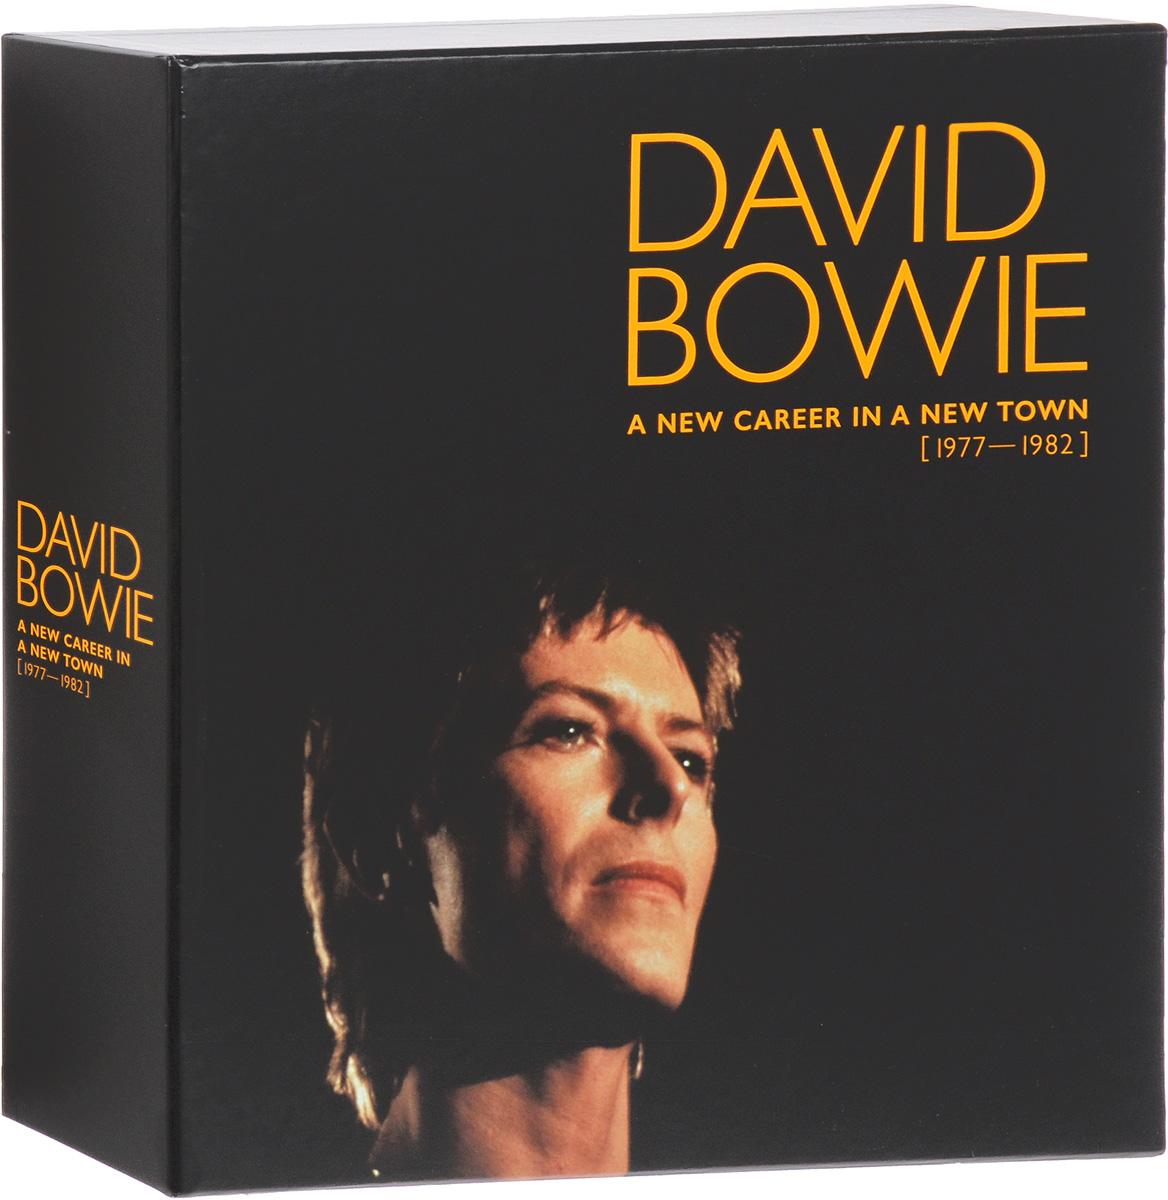 Дэвид Боуи,Брайан Ино,Карлос Аломар,Queen,Бинг Кросби David Bowie. A New Career In A New Town (1977-1982) (13 LP) eroc eroc eroc 1